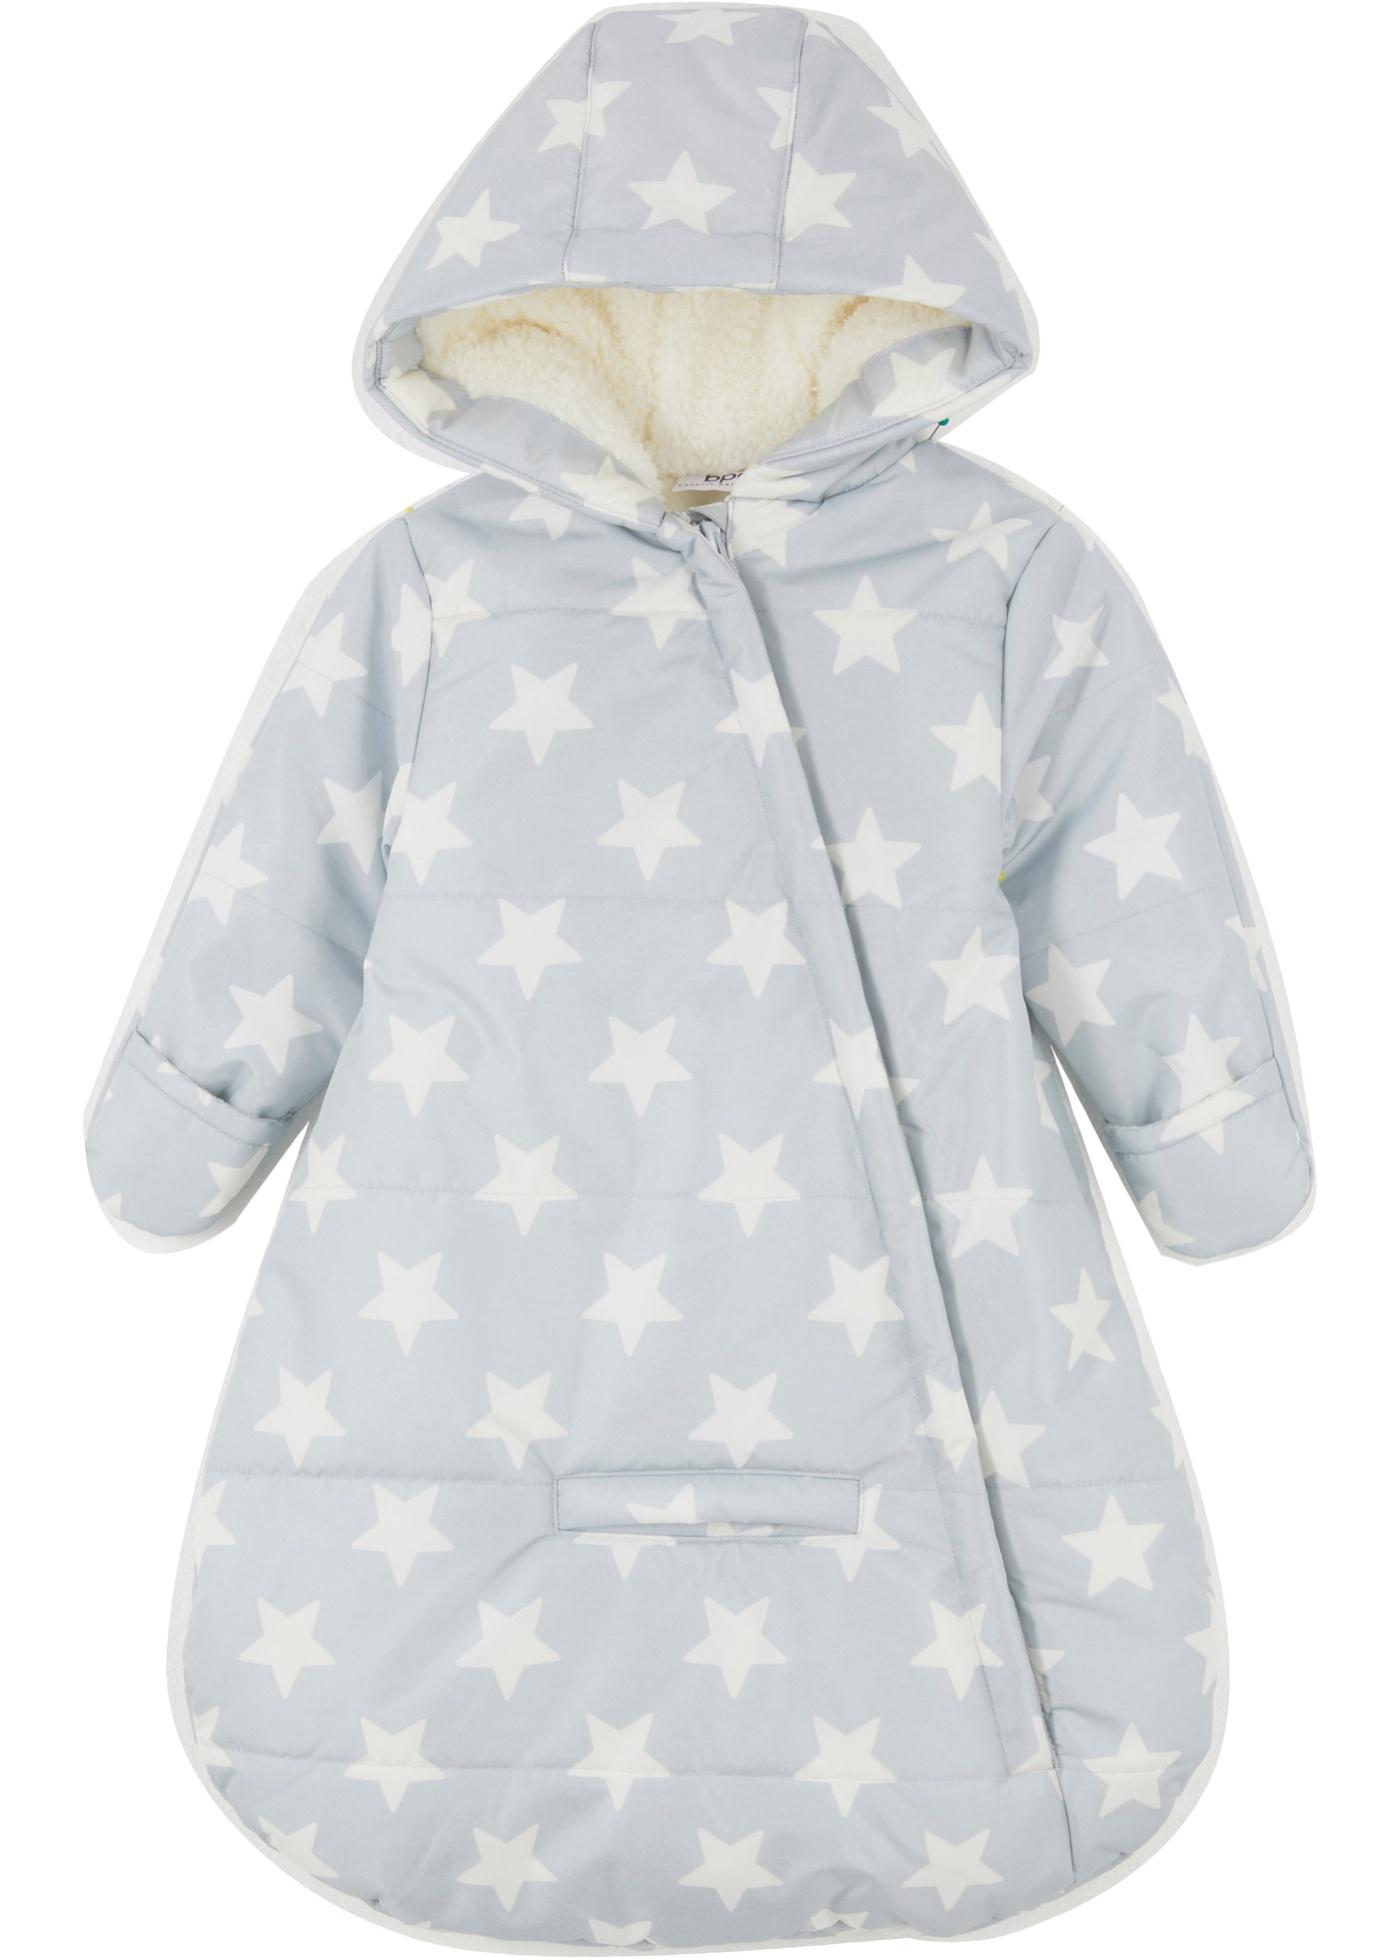 Vinterpose til baby